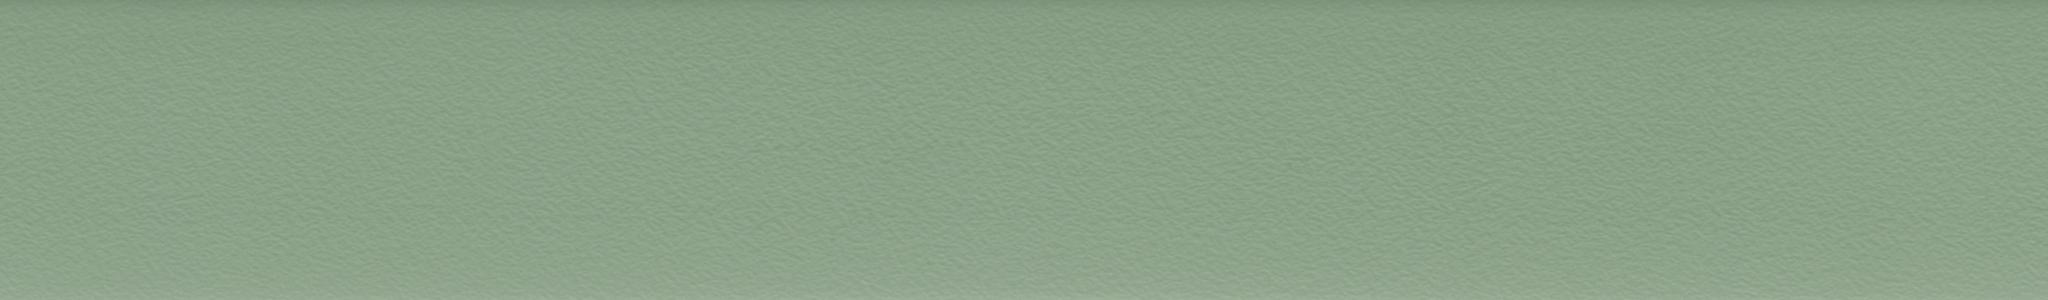 HU 16202 Chant ABS Vert Pesto Perle XG